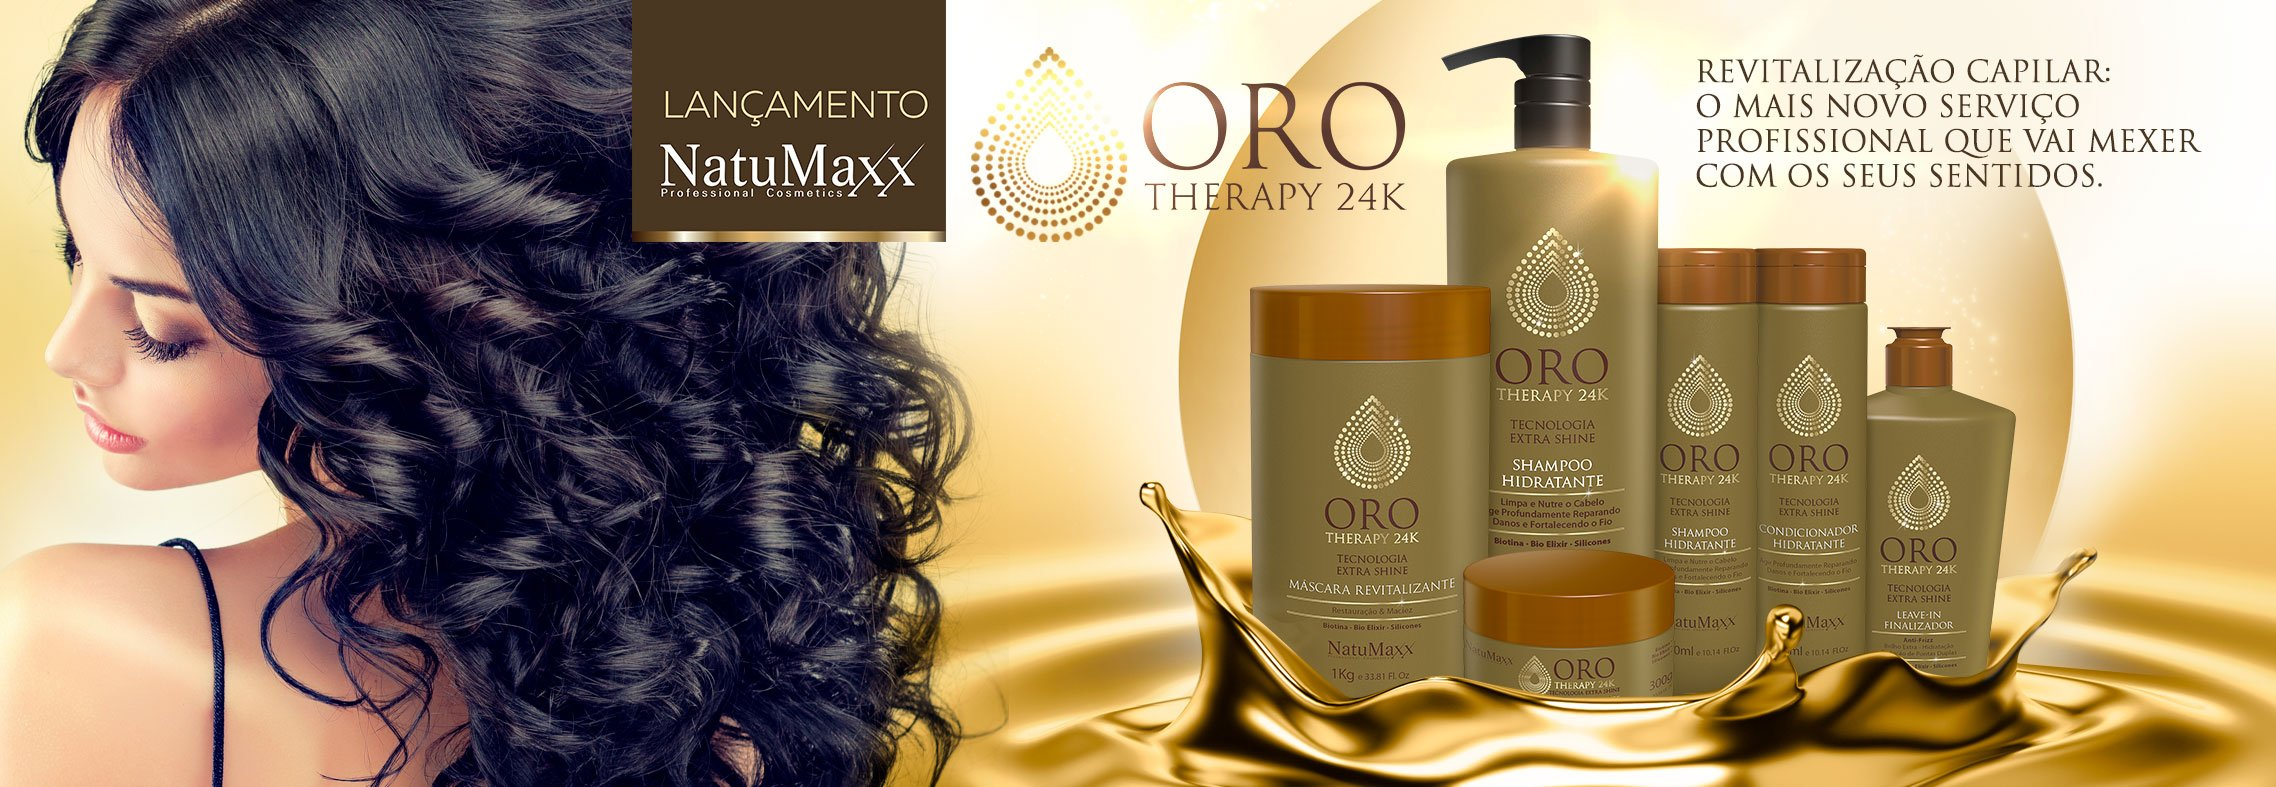 Kit Oro Therapy 24k Home Care Natumaxx 3 itens